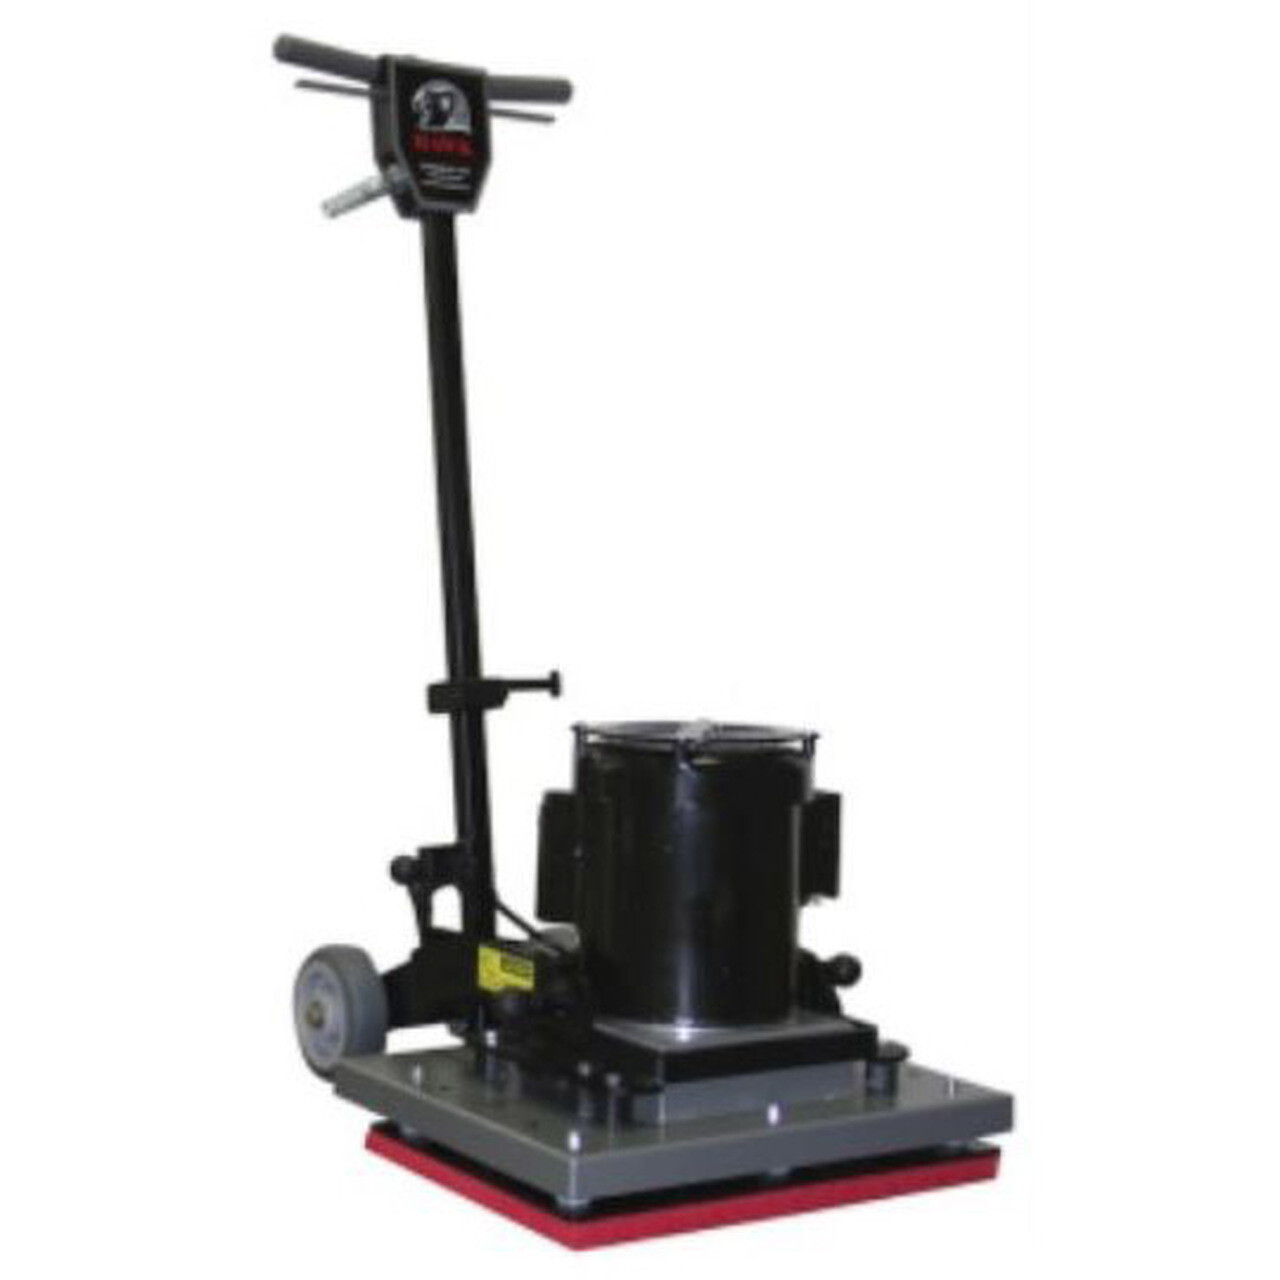 Hawk RedTail Orbital Floor Machine - 1725rpm